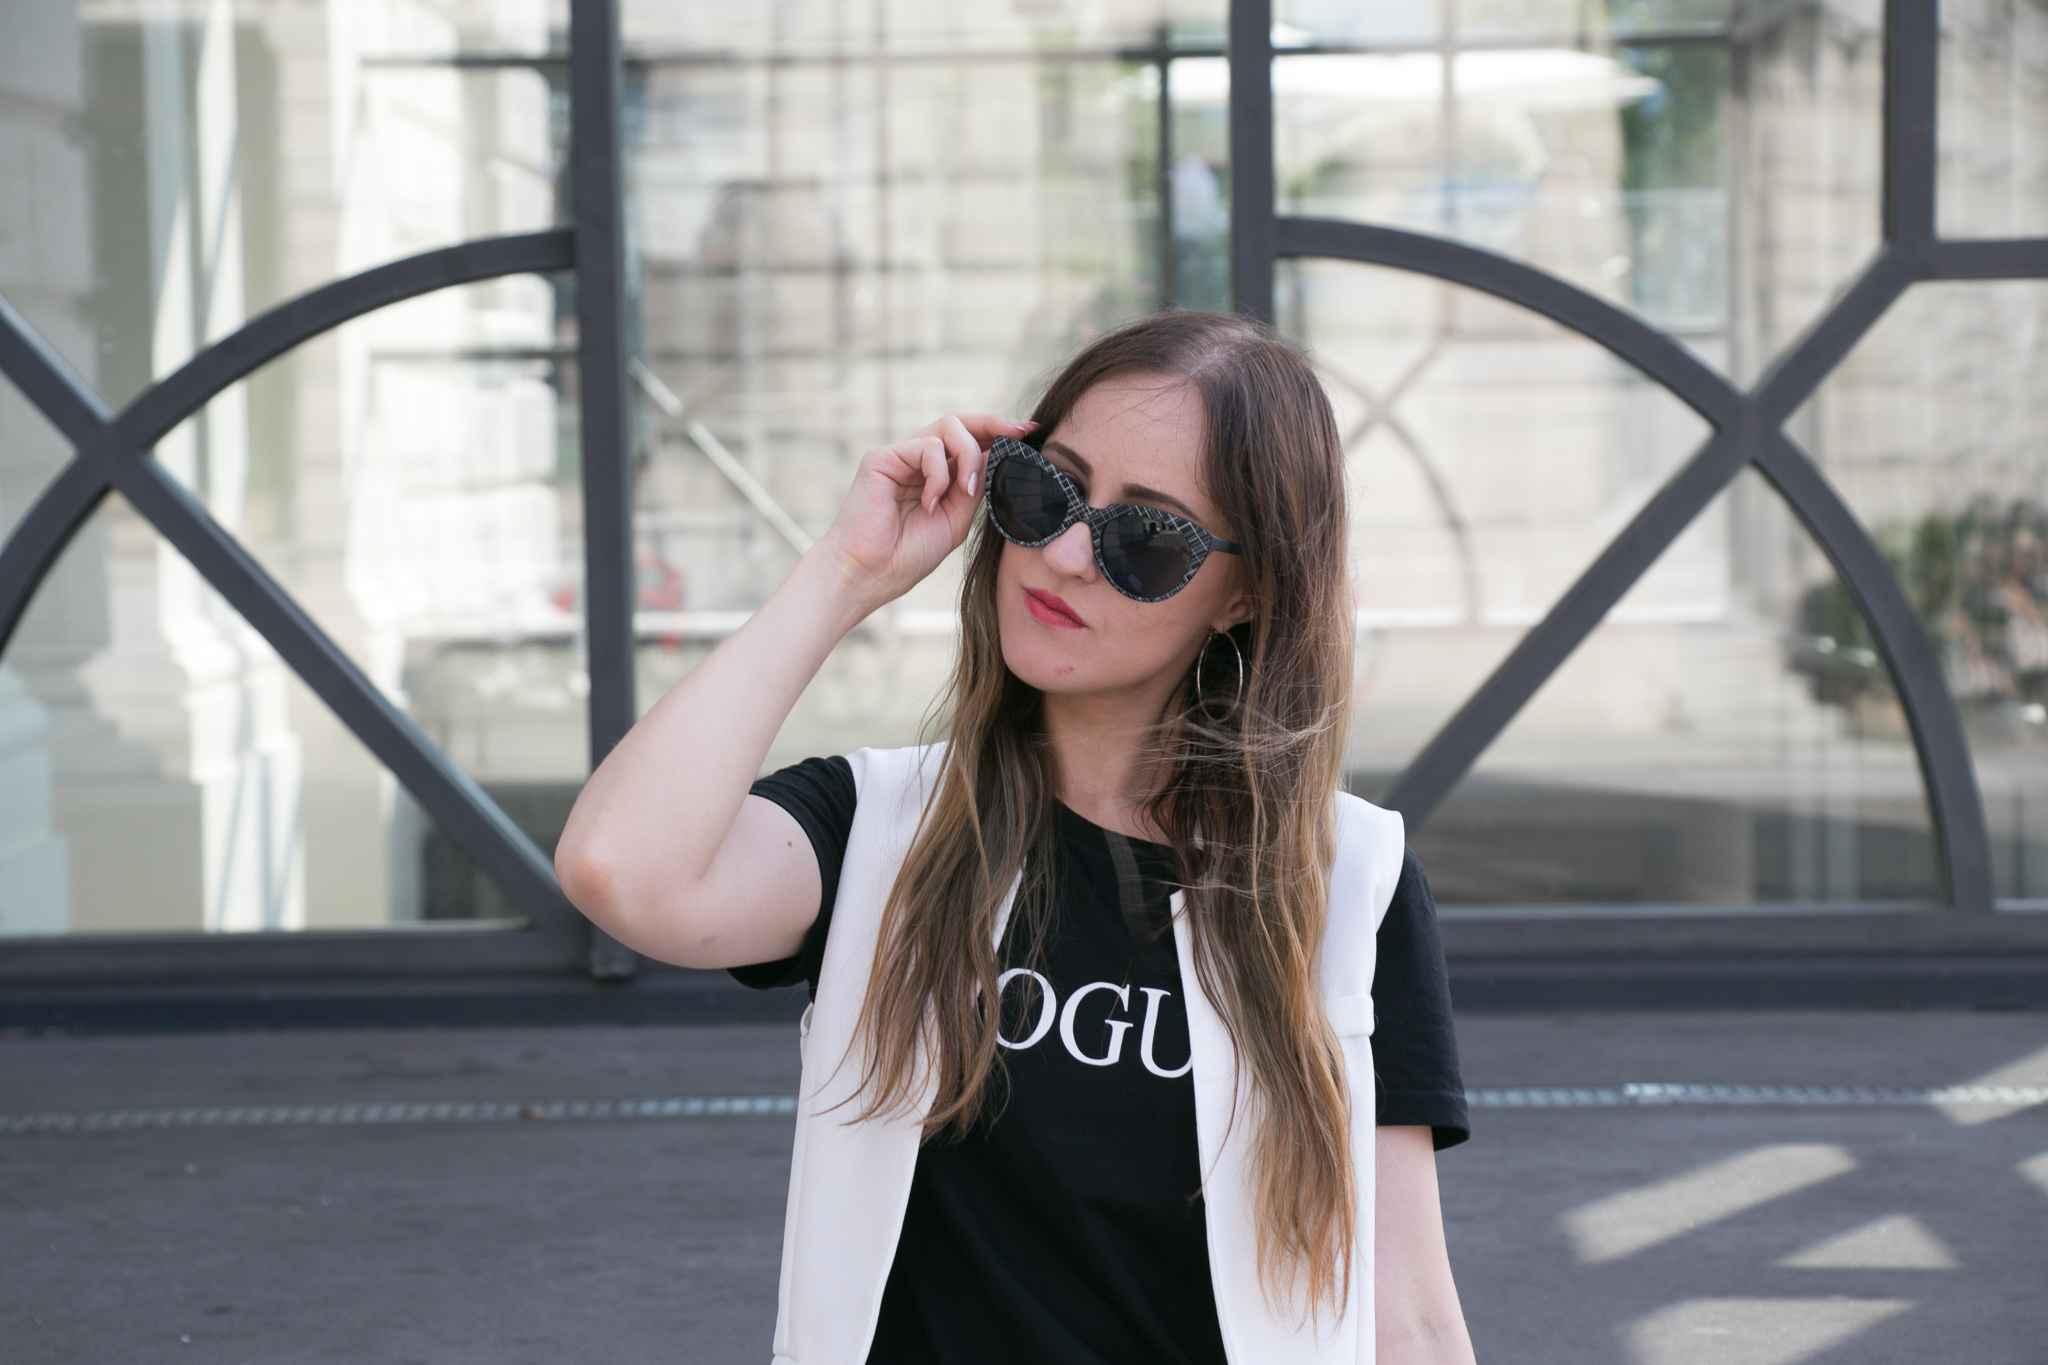 Lookbook Silhouette Zaxy Vogue Kistano